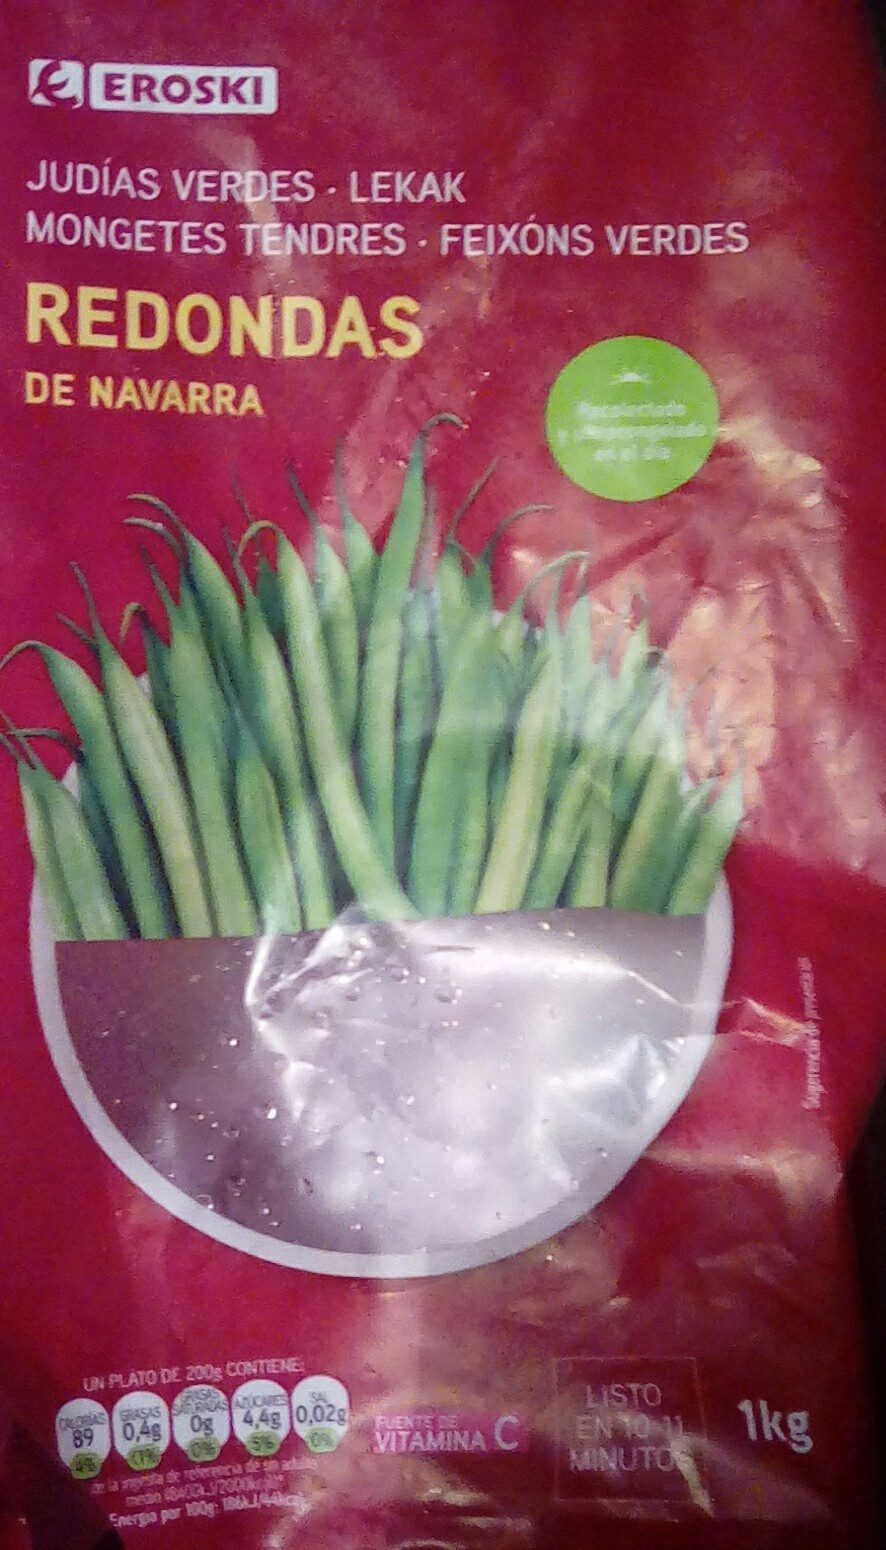 Judías verdes redondas de Navarra - Producto